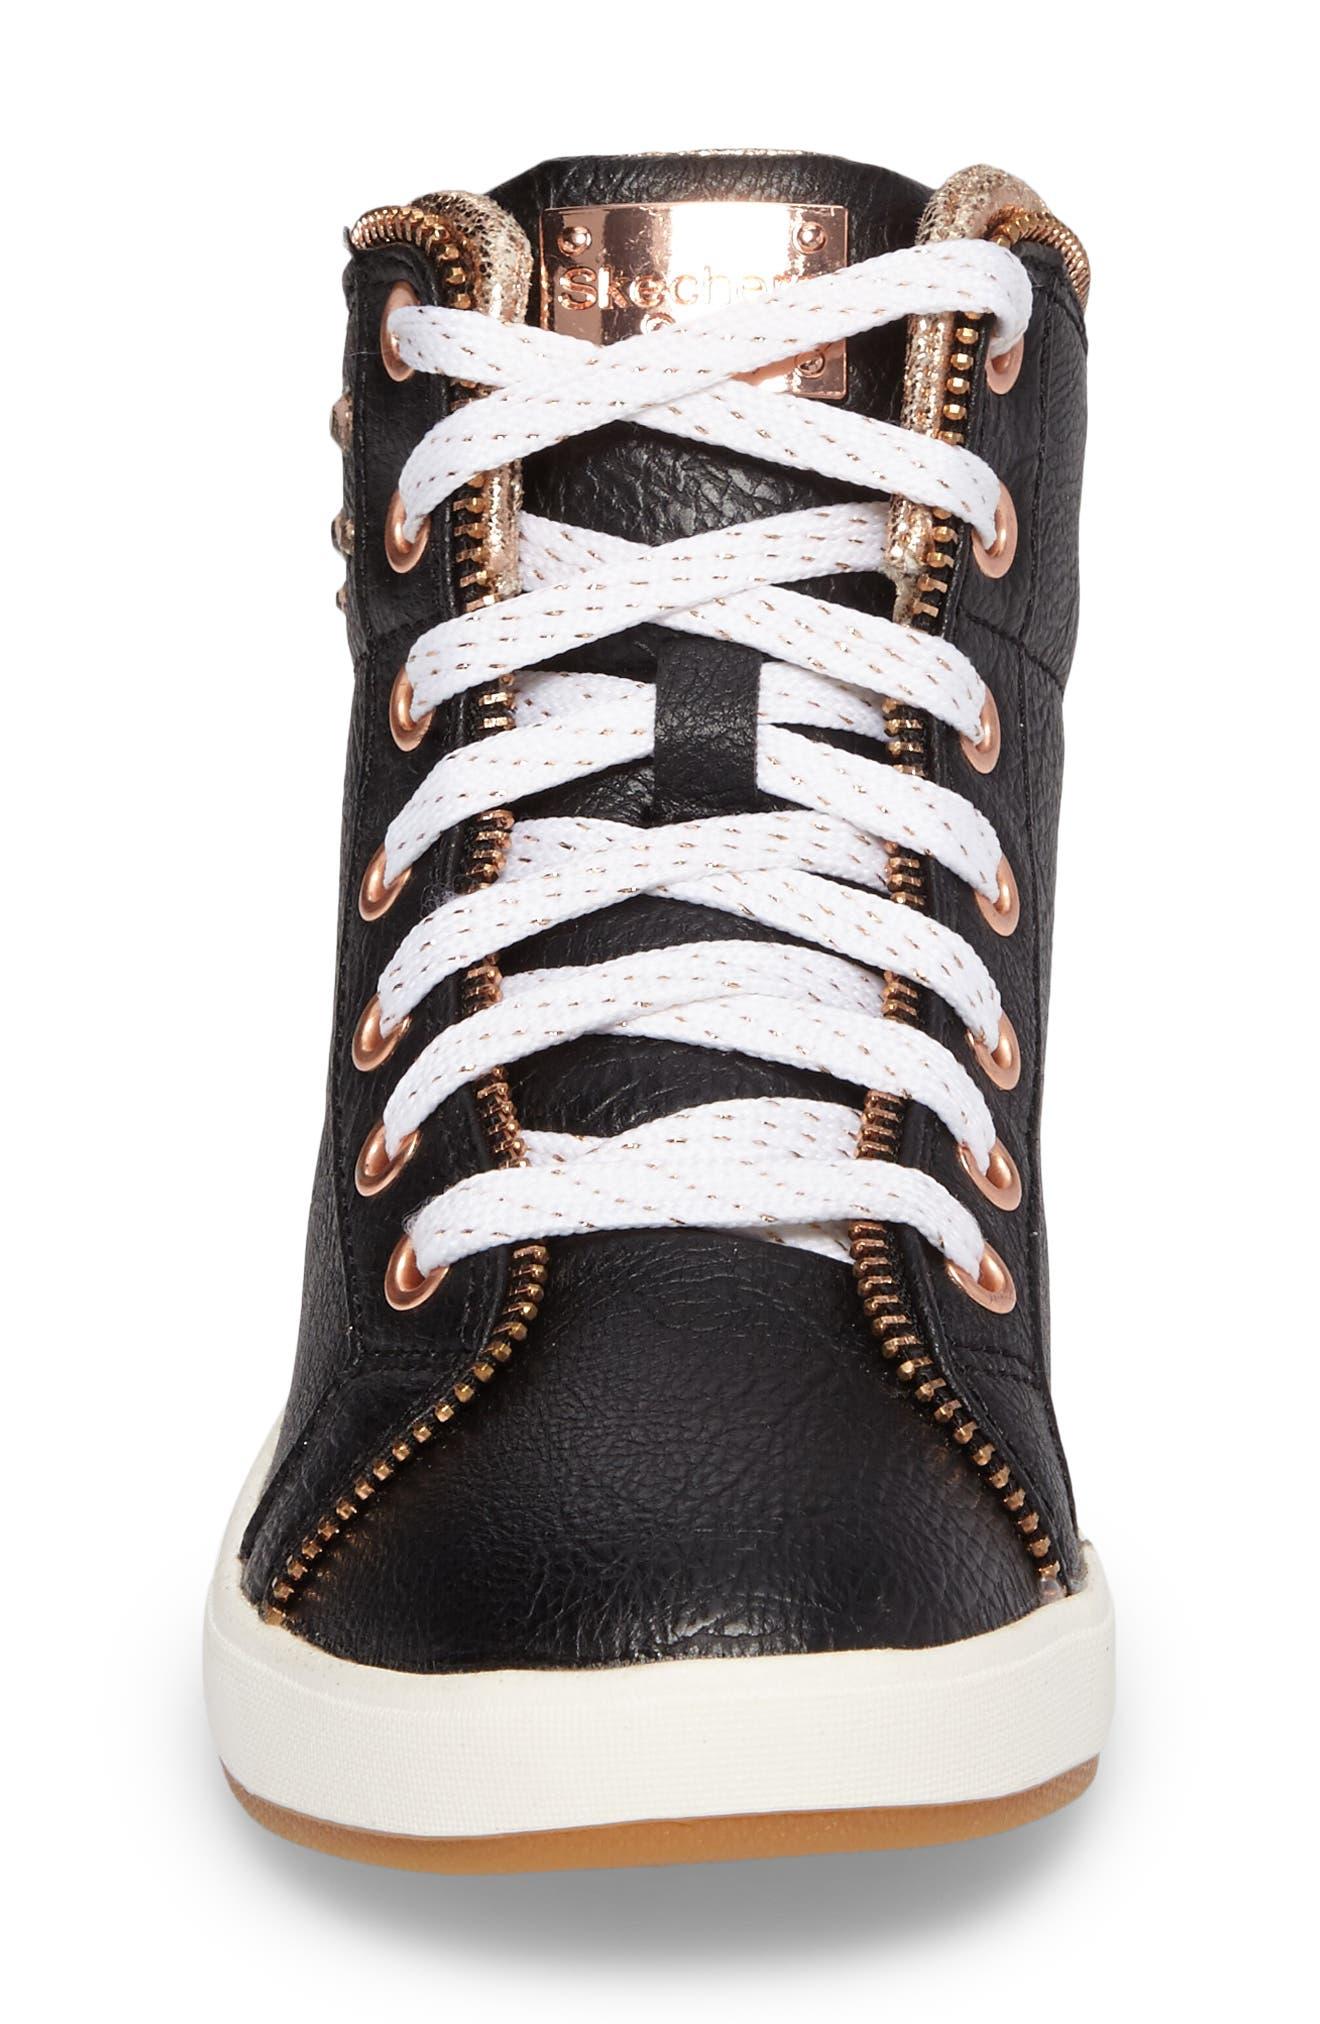 Shoutouts Embellished High Top Sneaker,                             Alternate thumbnail 4, color,                             Black/ Rose Gold